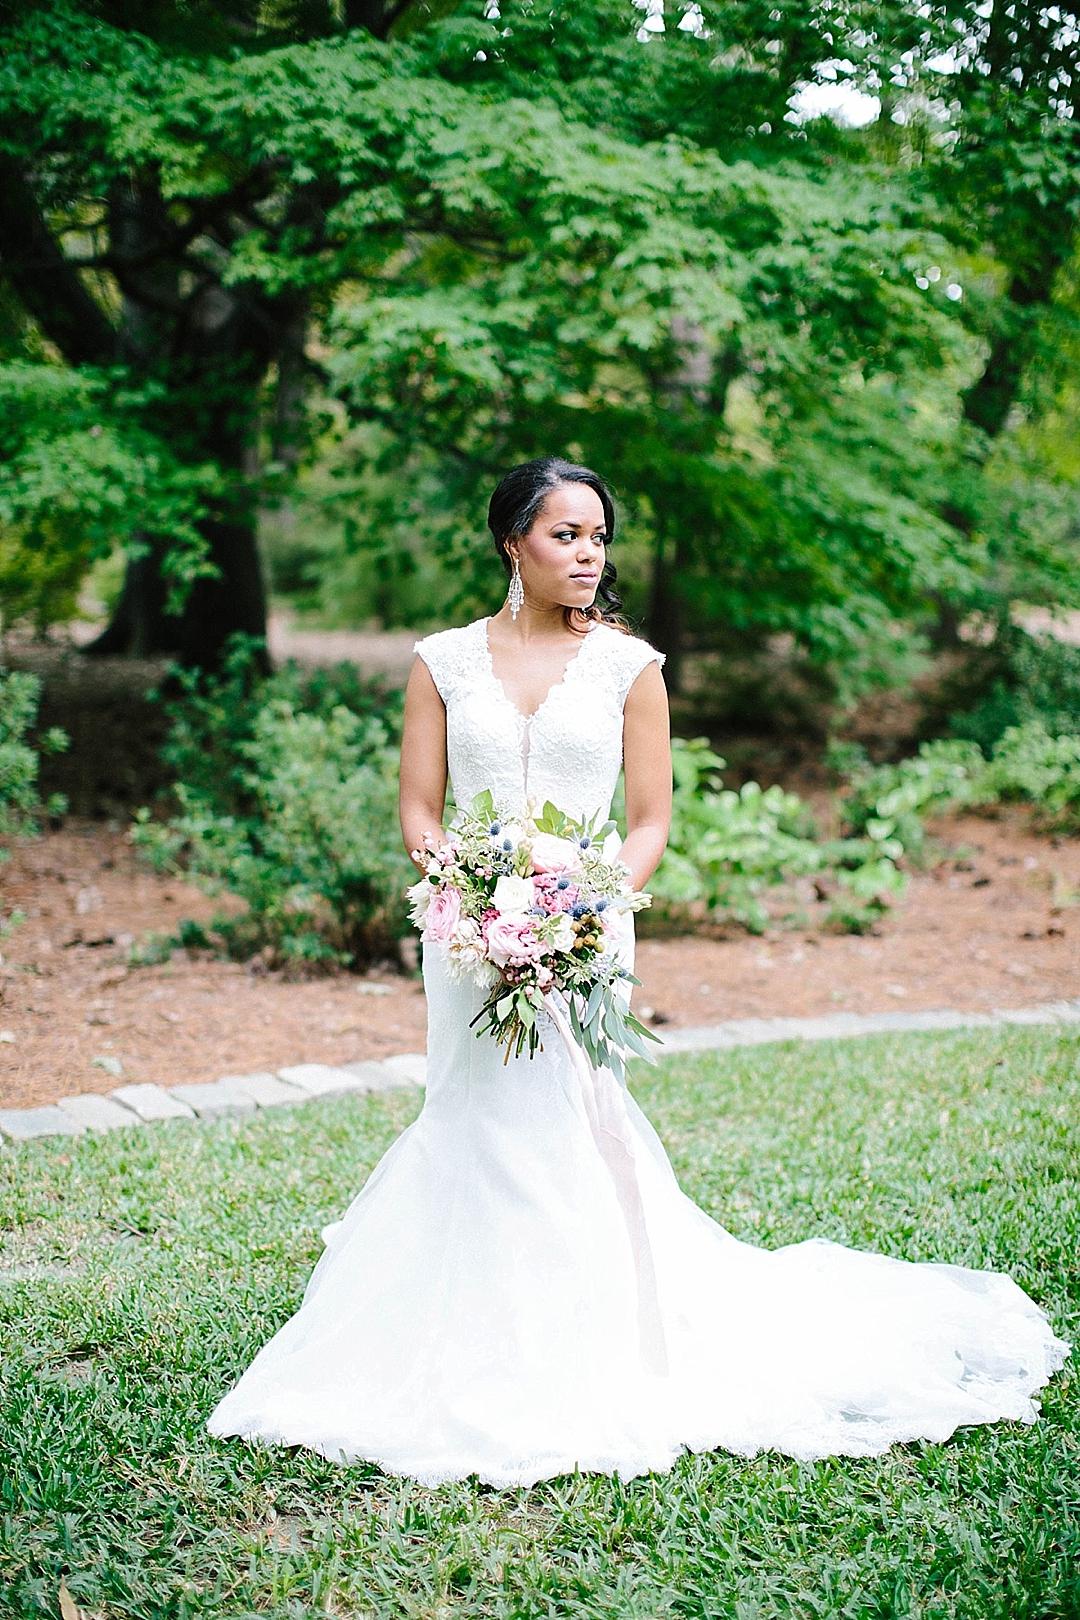 davids bridal for aisle society - bridal gown